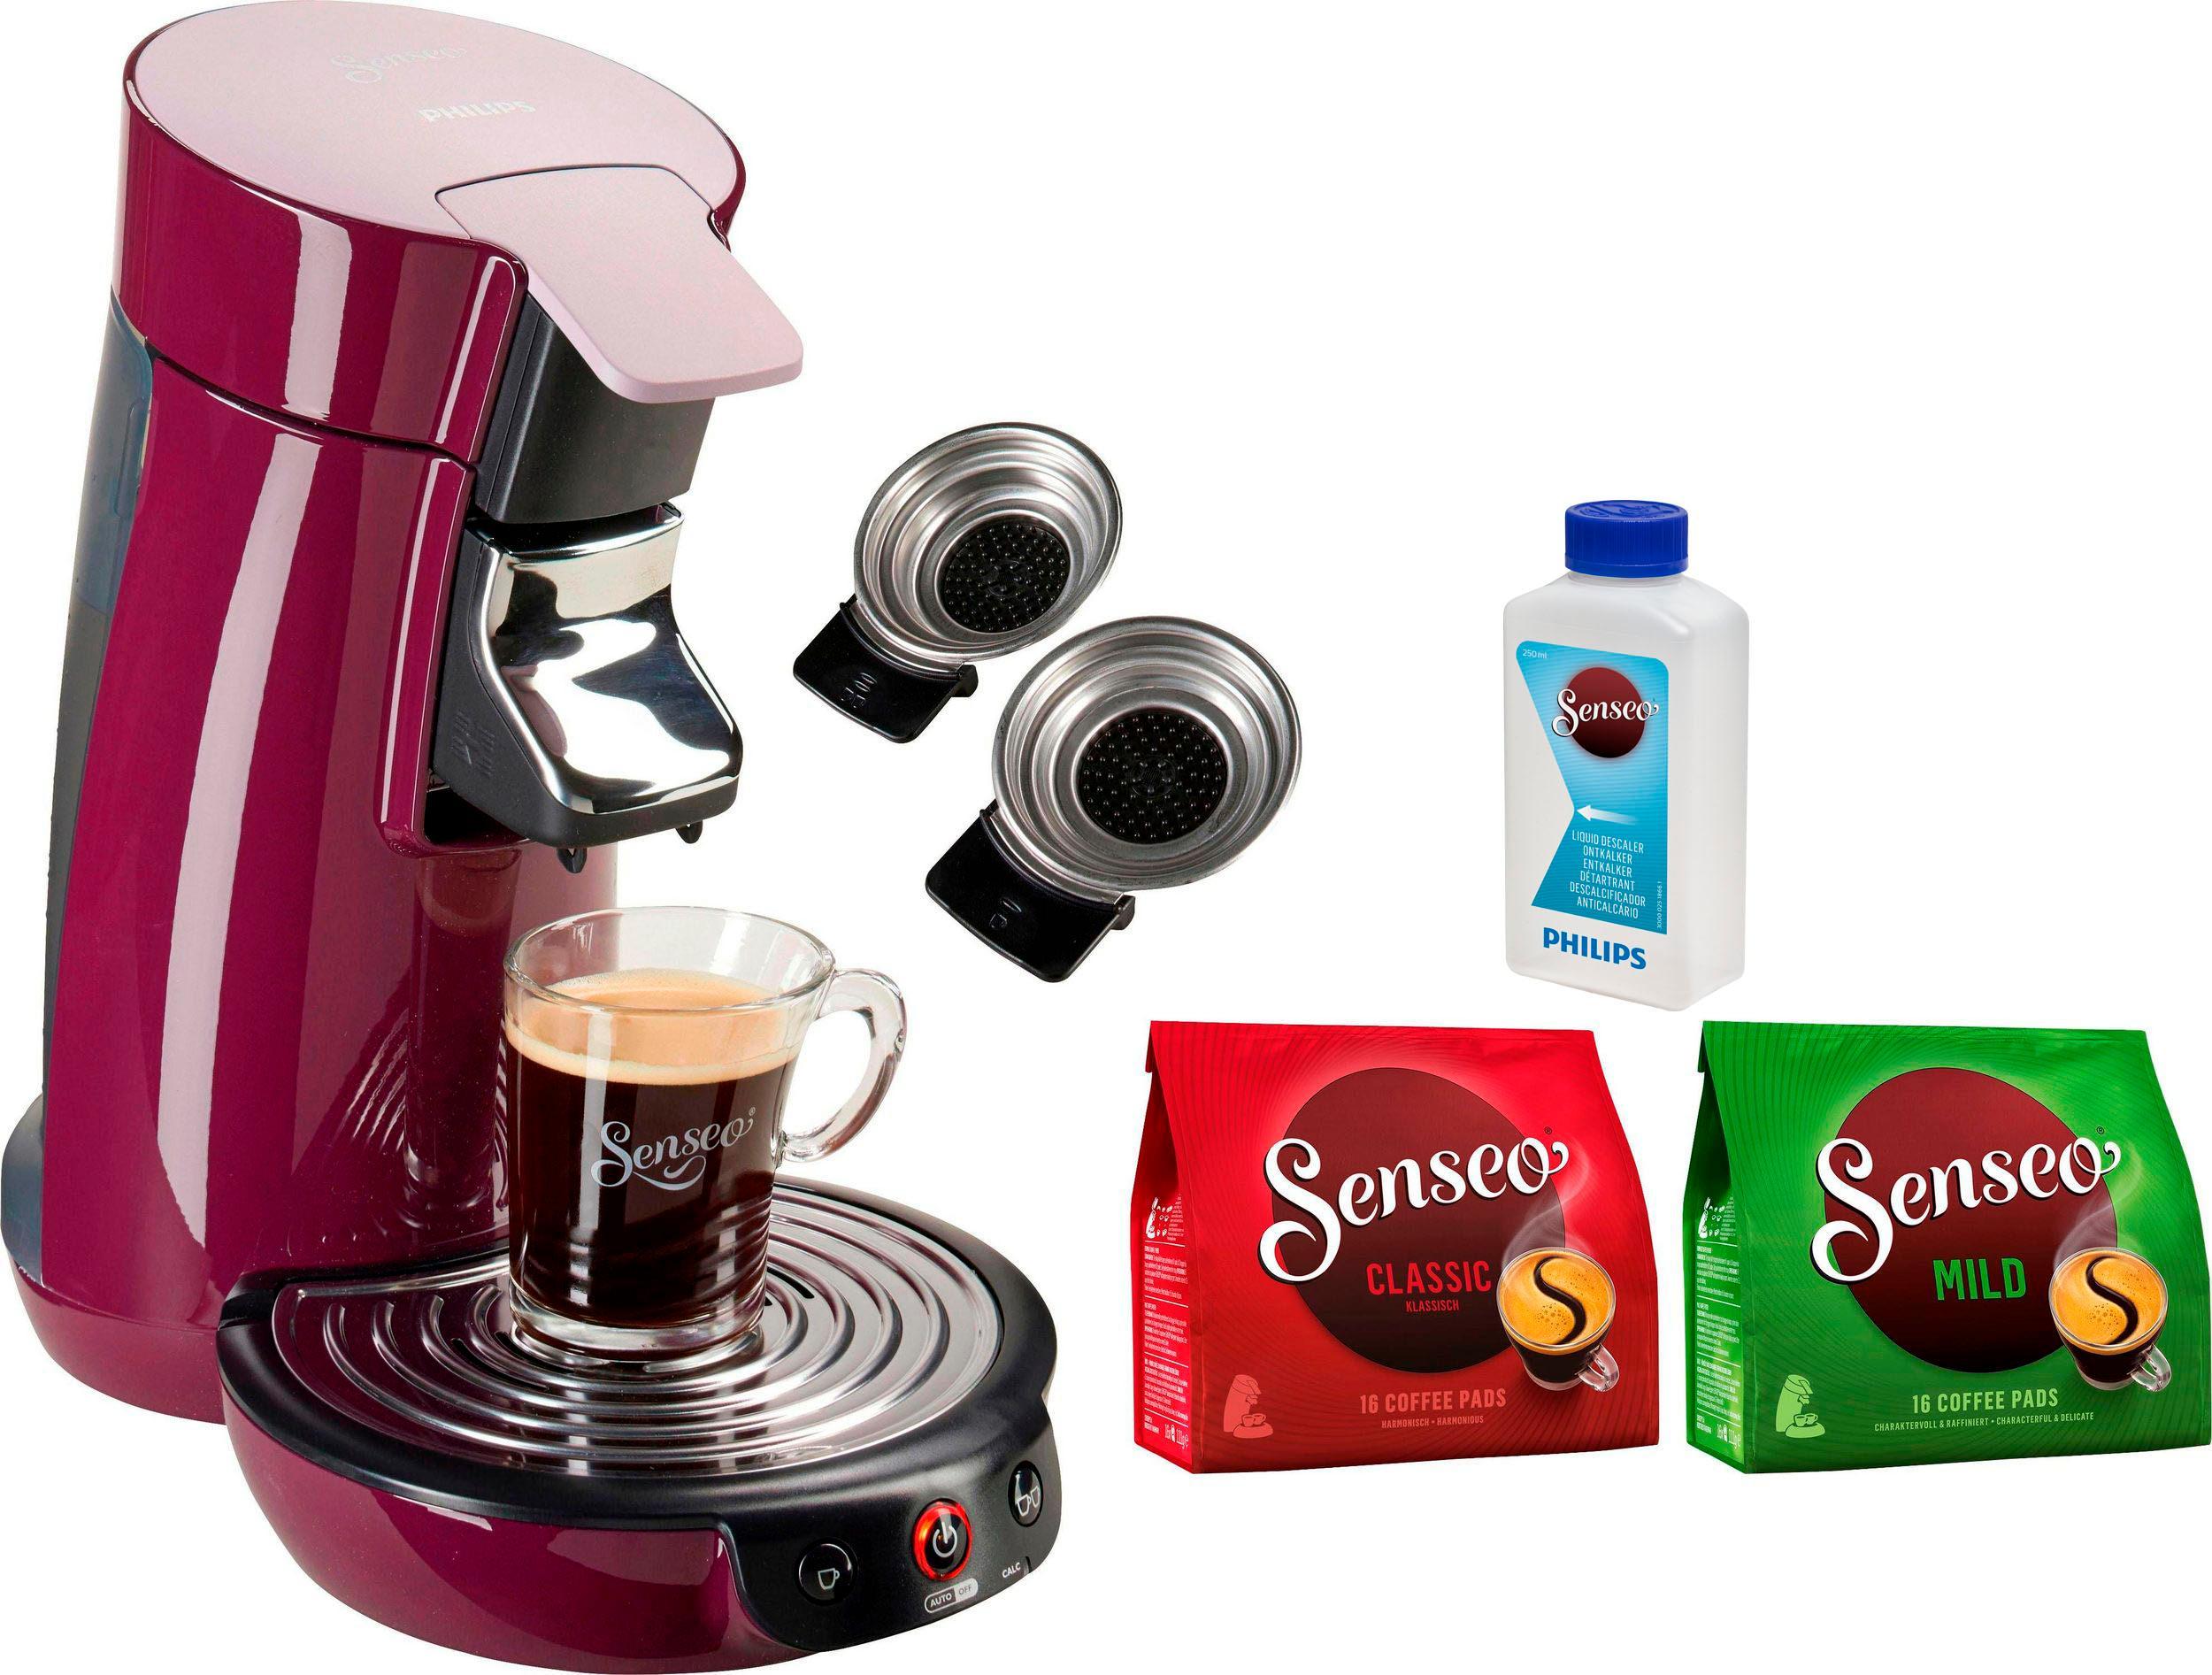 senseo kaffeepadmaschine senseo viva caf hd6563 90 auf. Black Bedroom Furniture Sets. Home Design Ideas